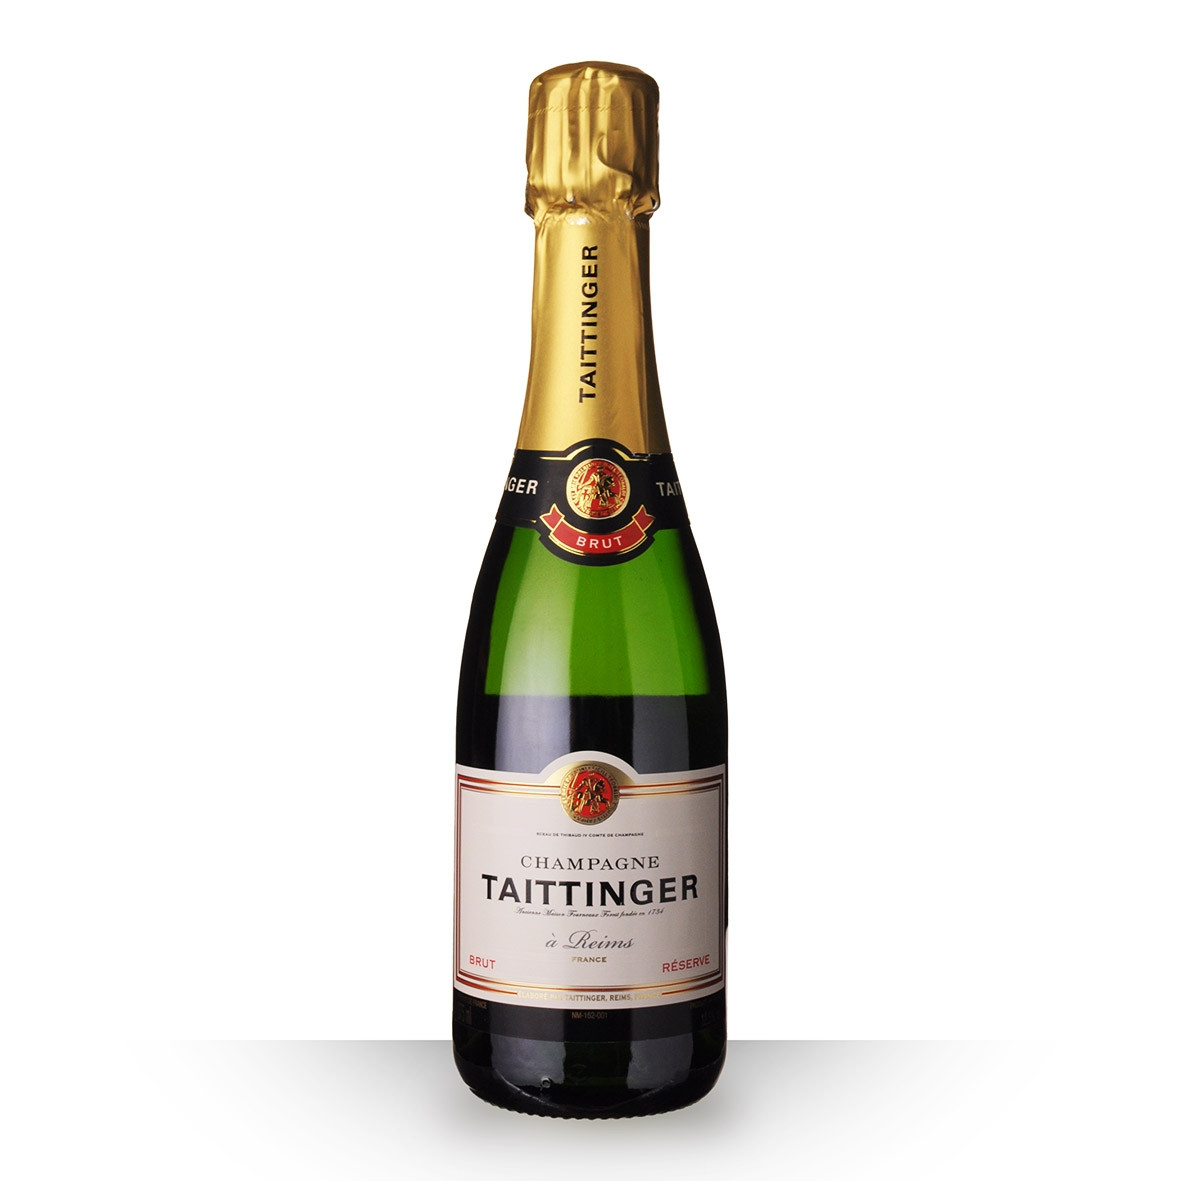 Champagne Taittinger Brut Réserve 37,5cl www.odyssee-vins.com